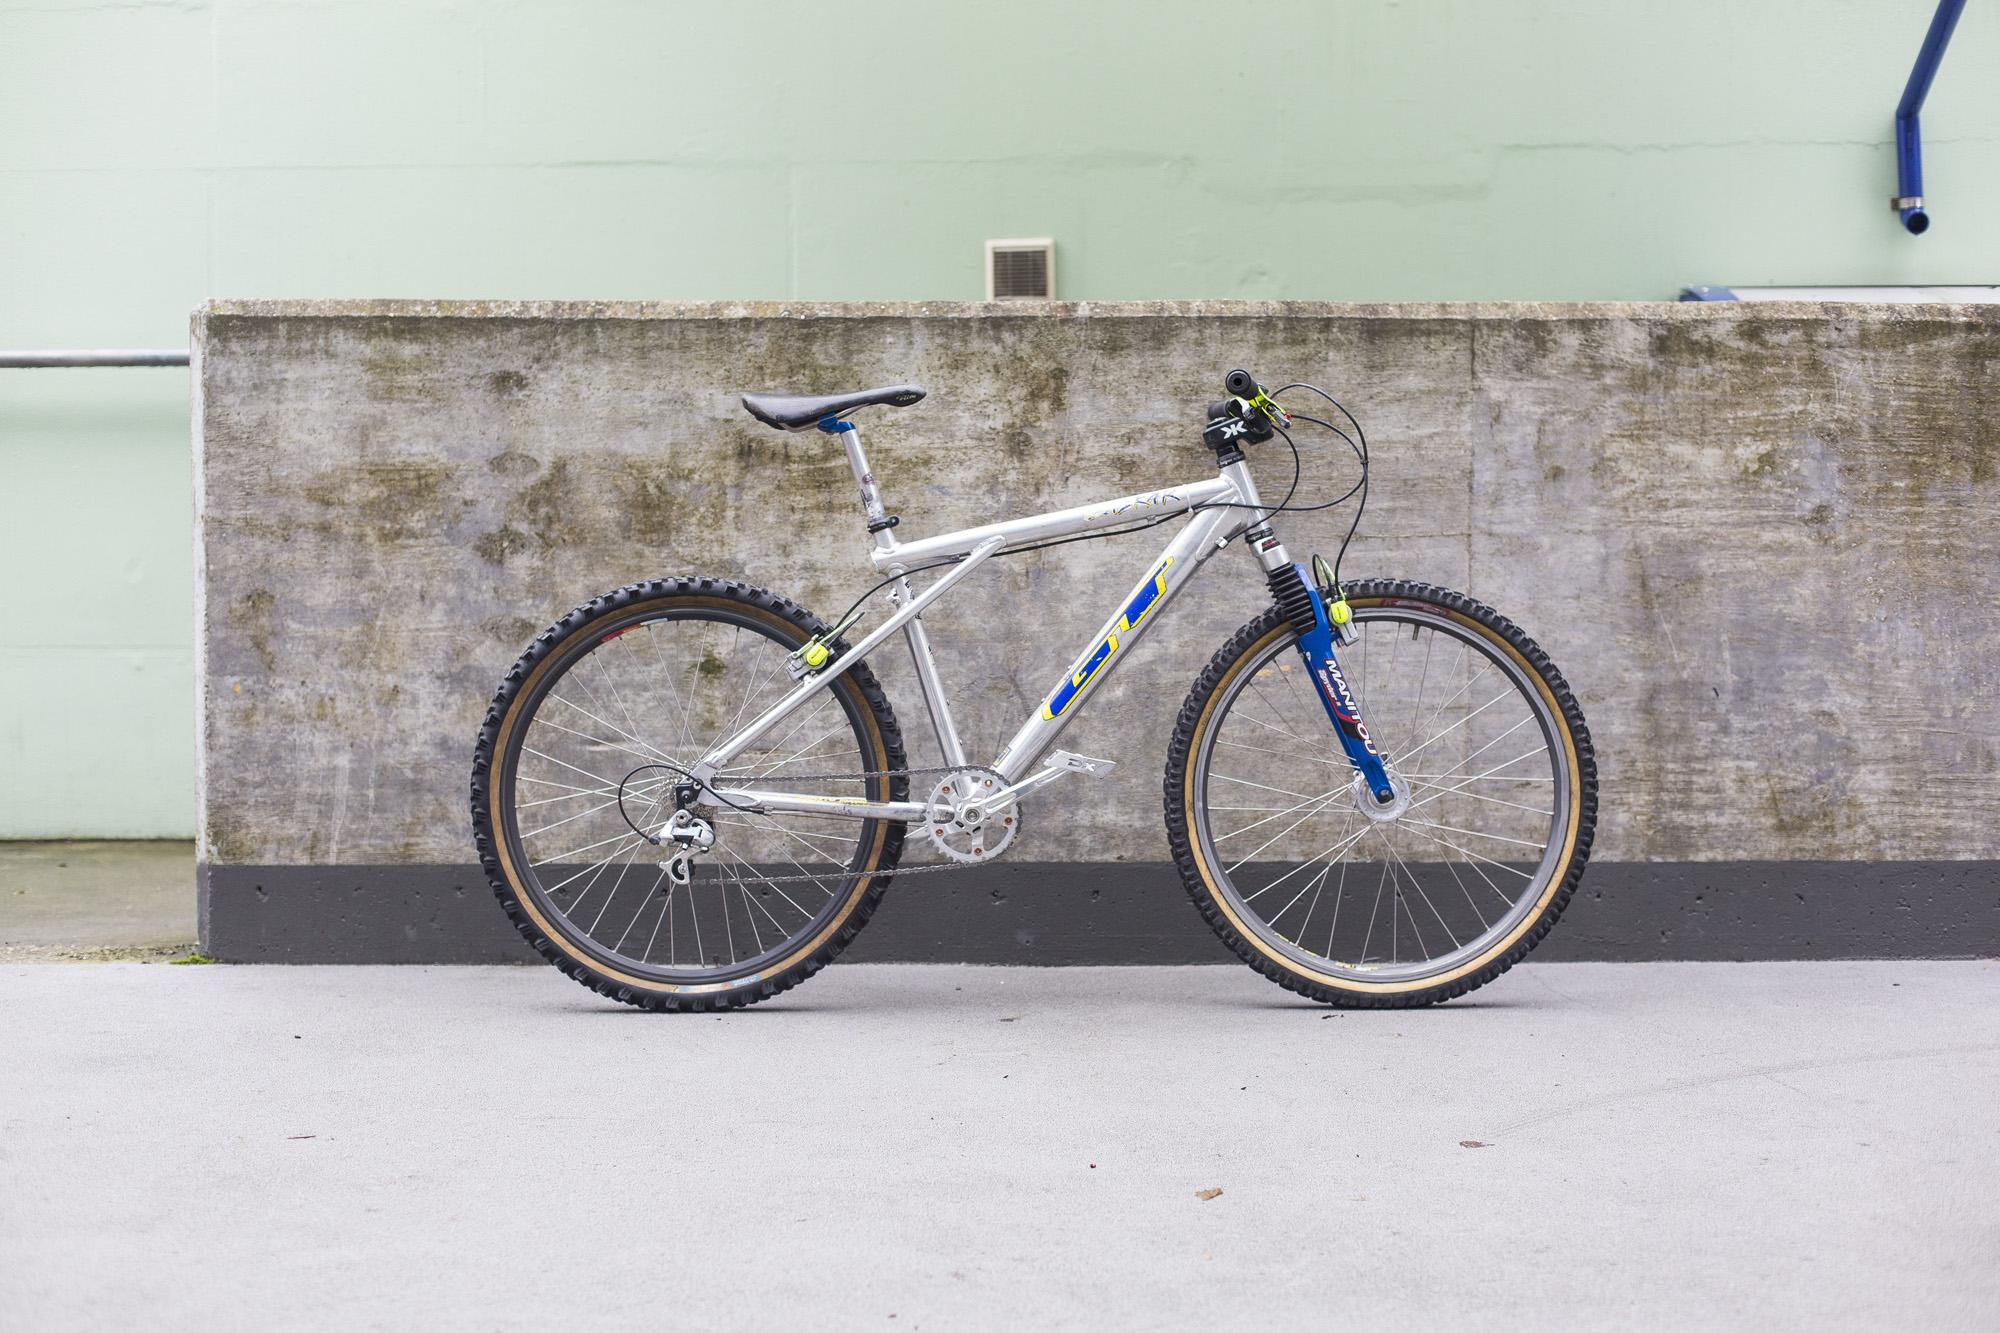 seabass-cycles-bikes-instore-5-february-2019-gt-zaskar-1990-00433.jpg